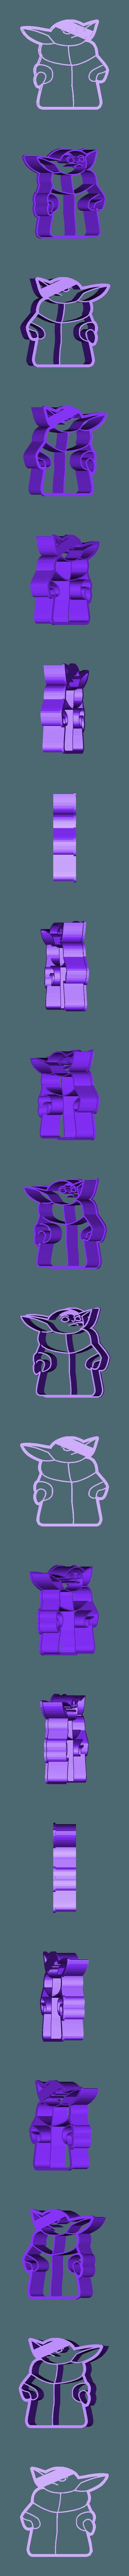 cookie-3Demon__Yoda-meme-Mandalorian-simple.stl Download STL file Yoda Baby Cookie Cutter Mandalorian • 3D printer design, 3D-mon